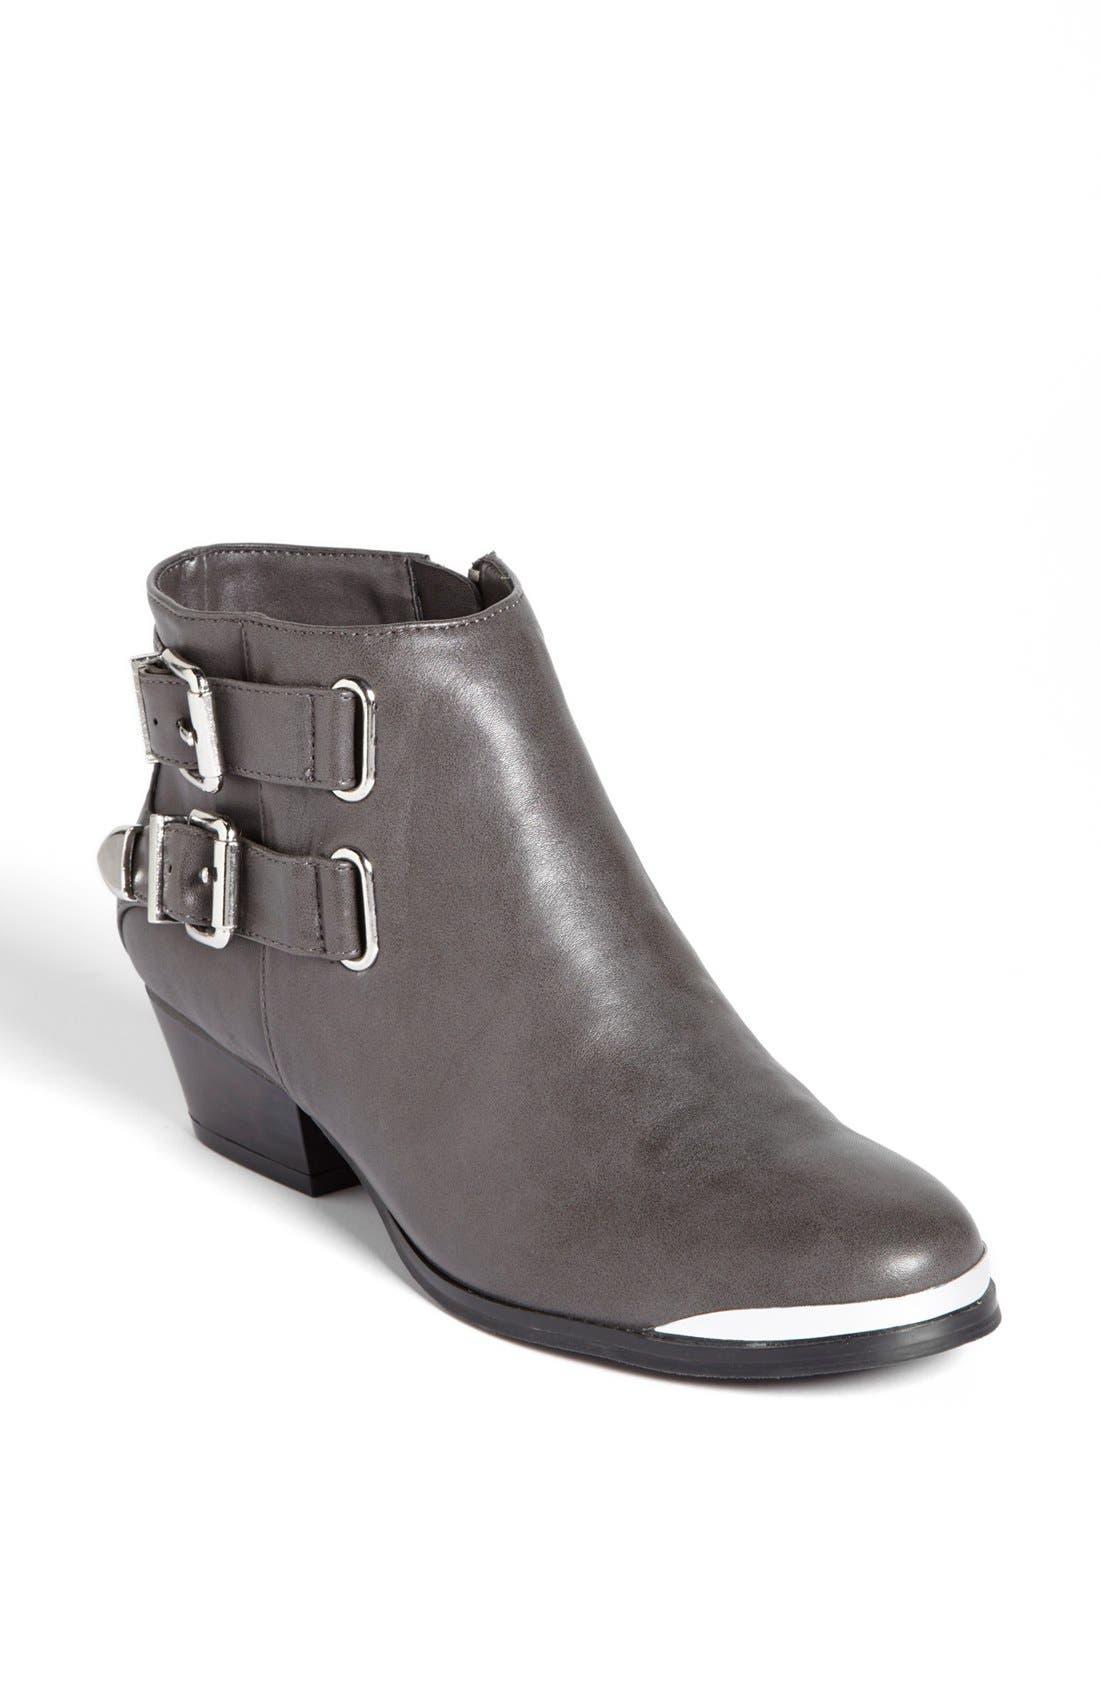 Alternate Image 1 Selected - Tildon 'Sable' Boot